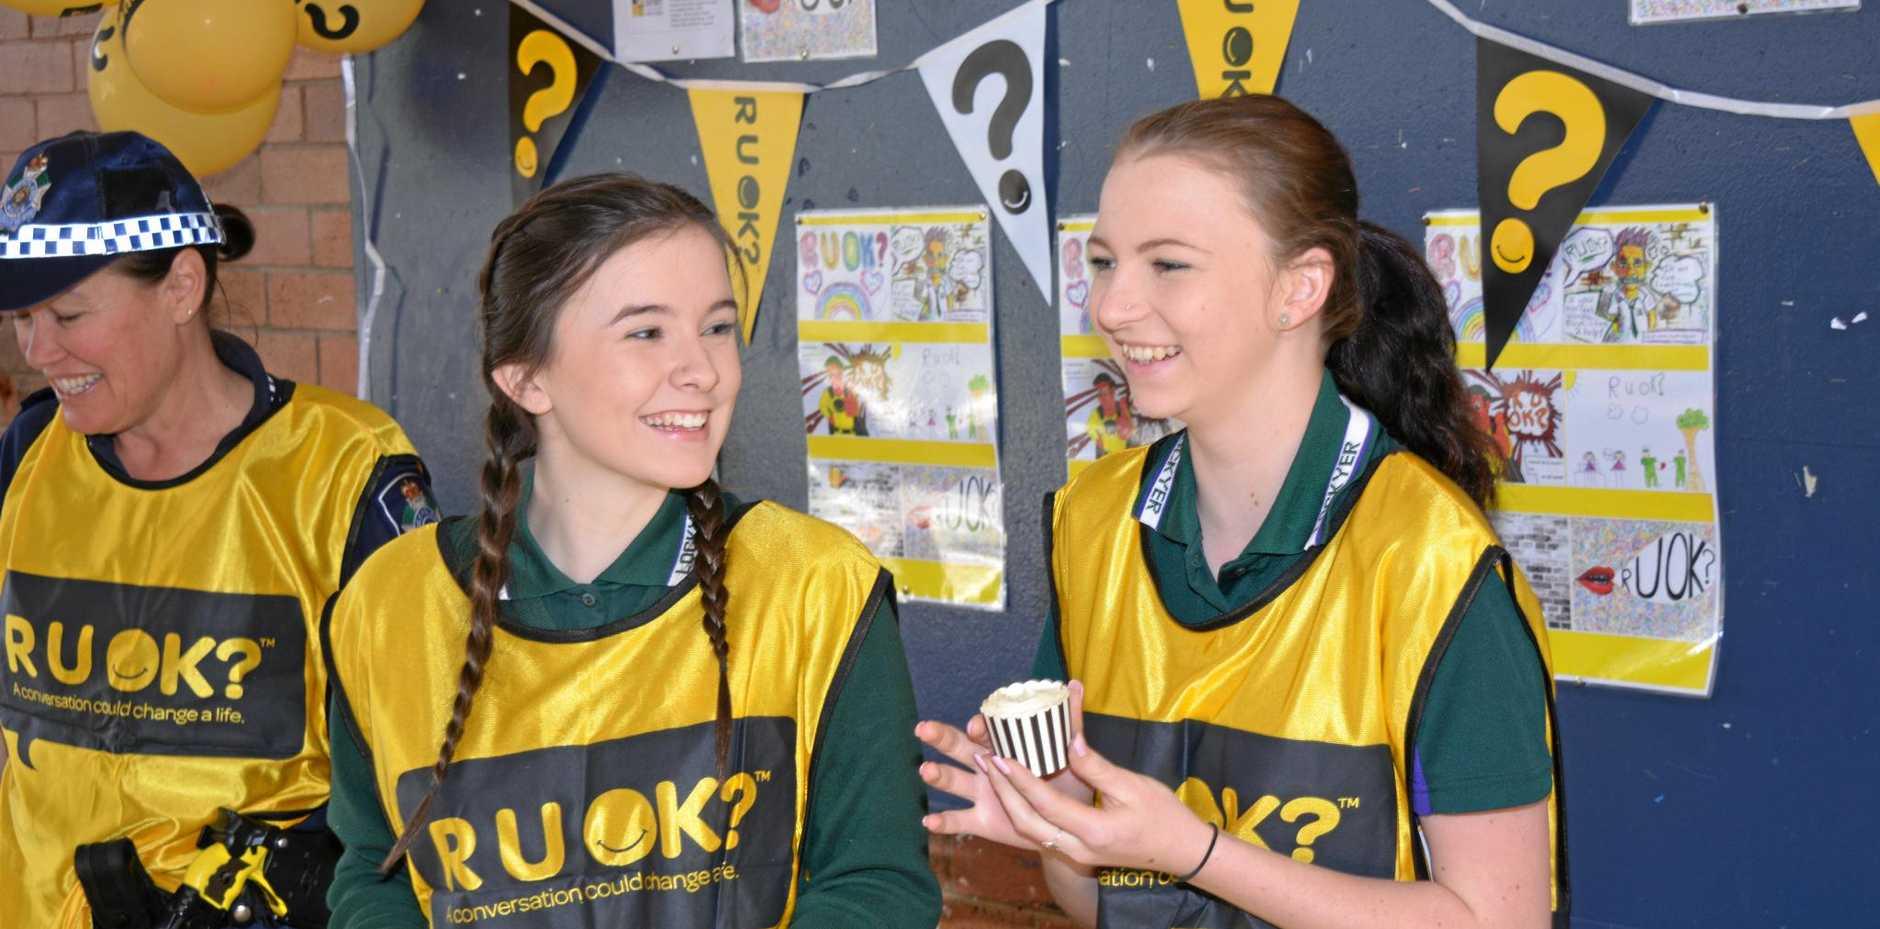 A-OK: Alysha Hickmott and Emma Ditchmen at the R U OK? Day stall.